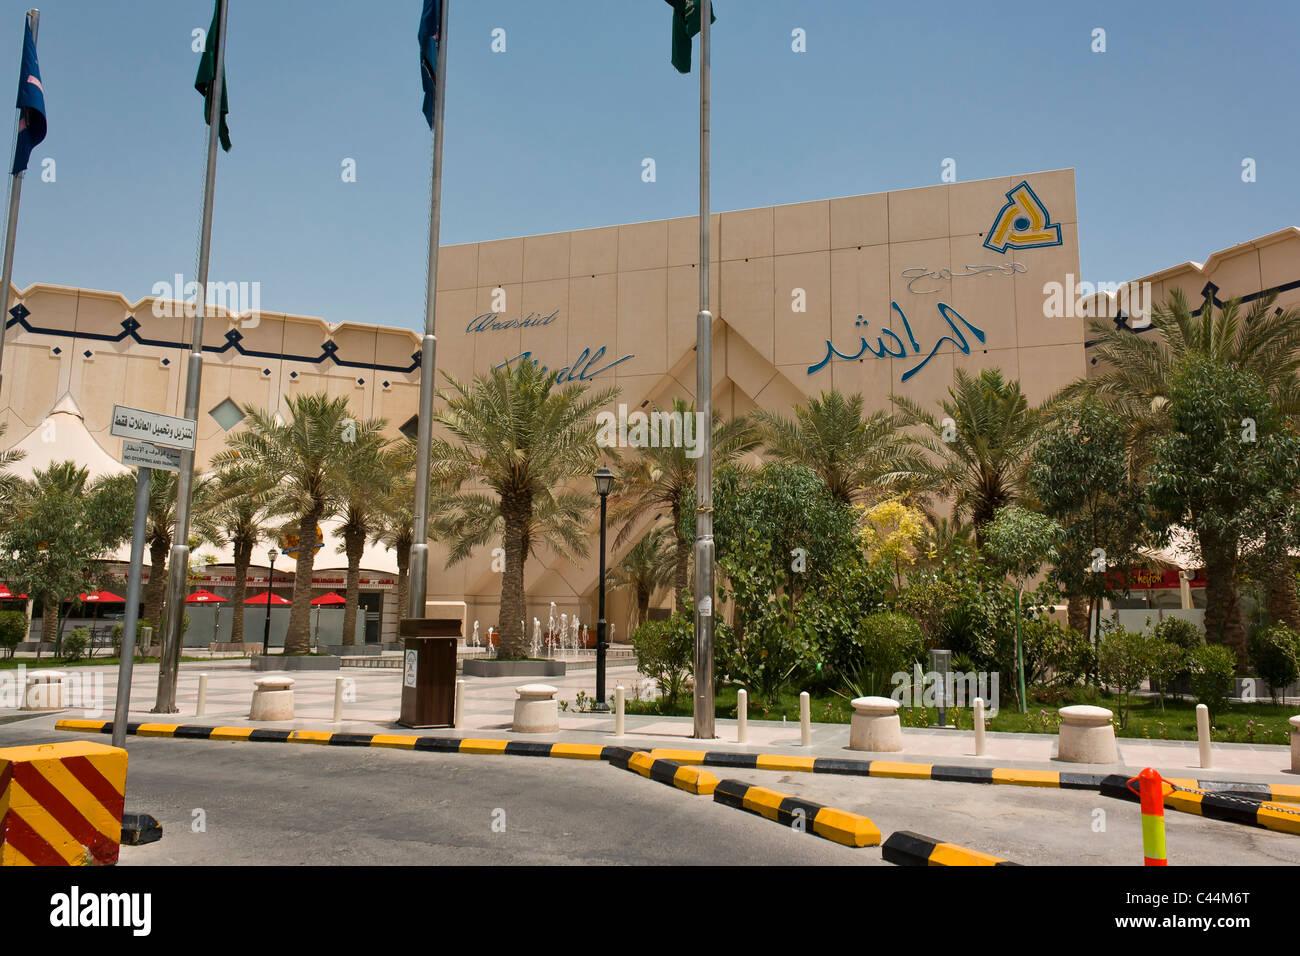 Al Rashed Mall, Khobar, Kingdom of Saudi Arabia. - Stock Image